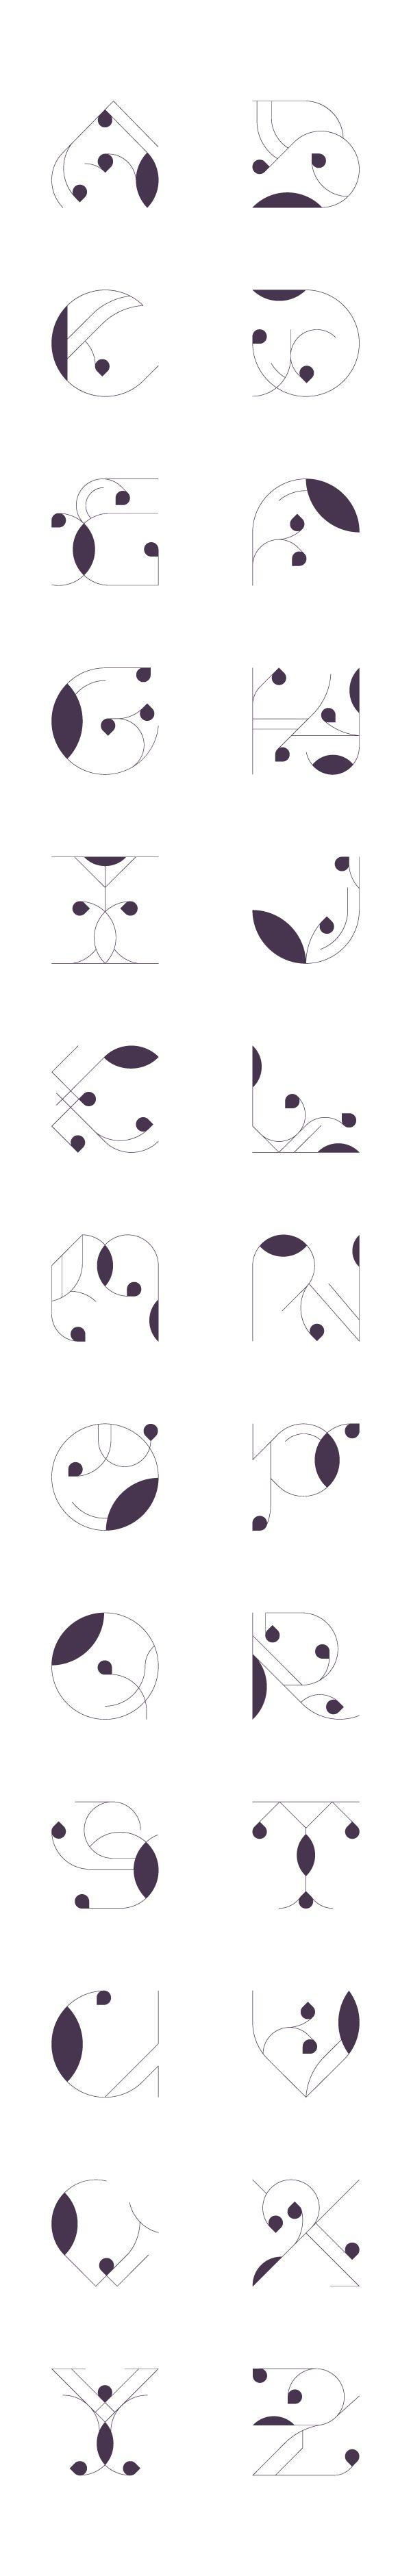 Molde de letra 1